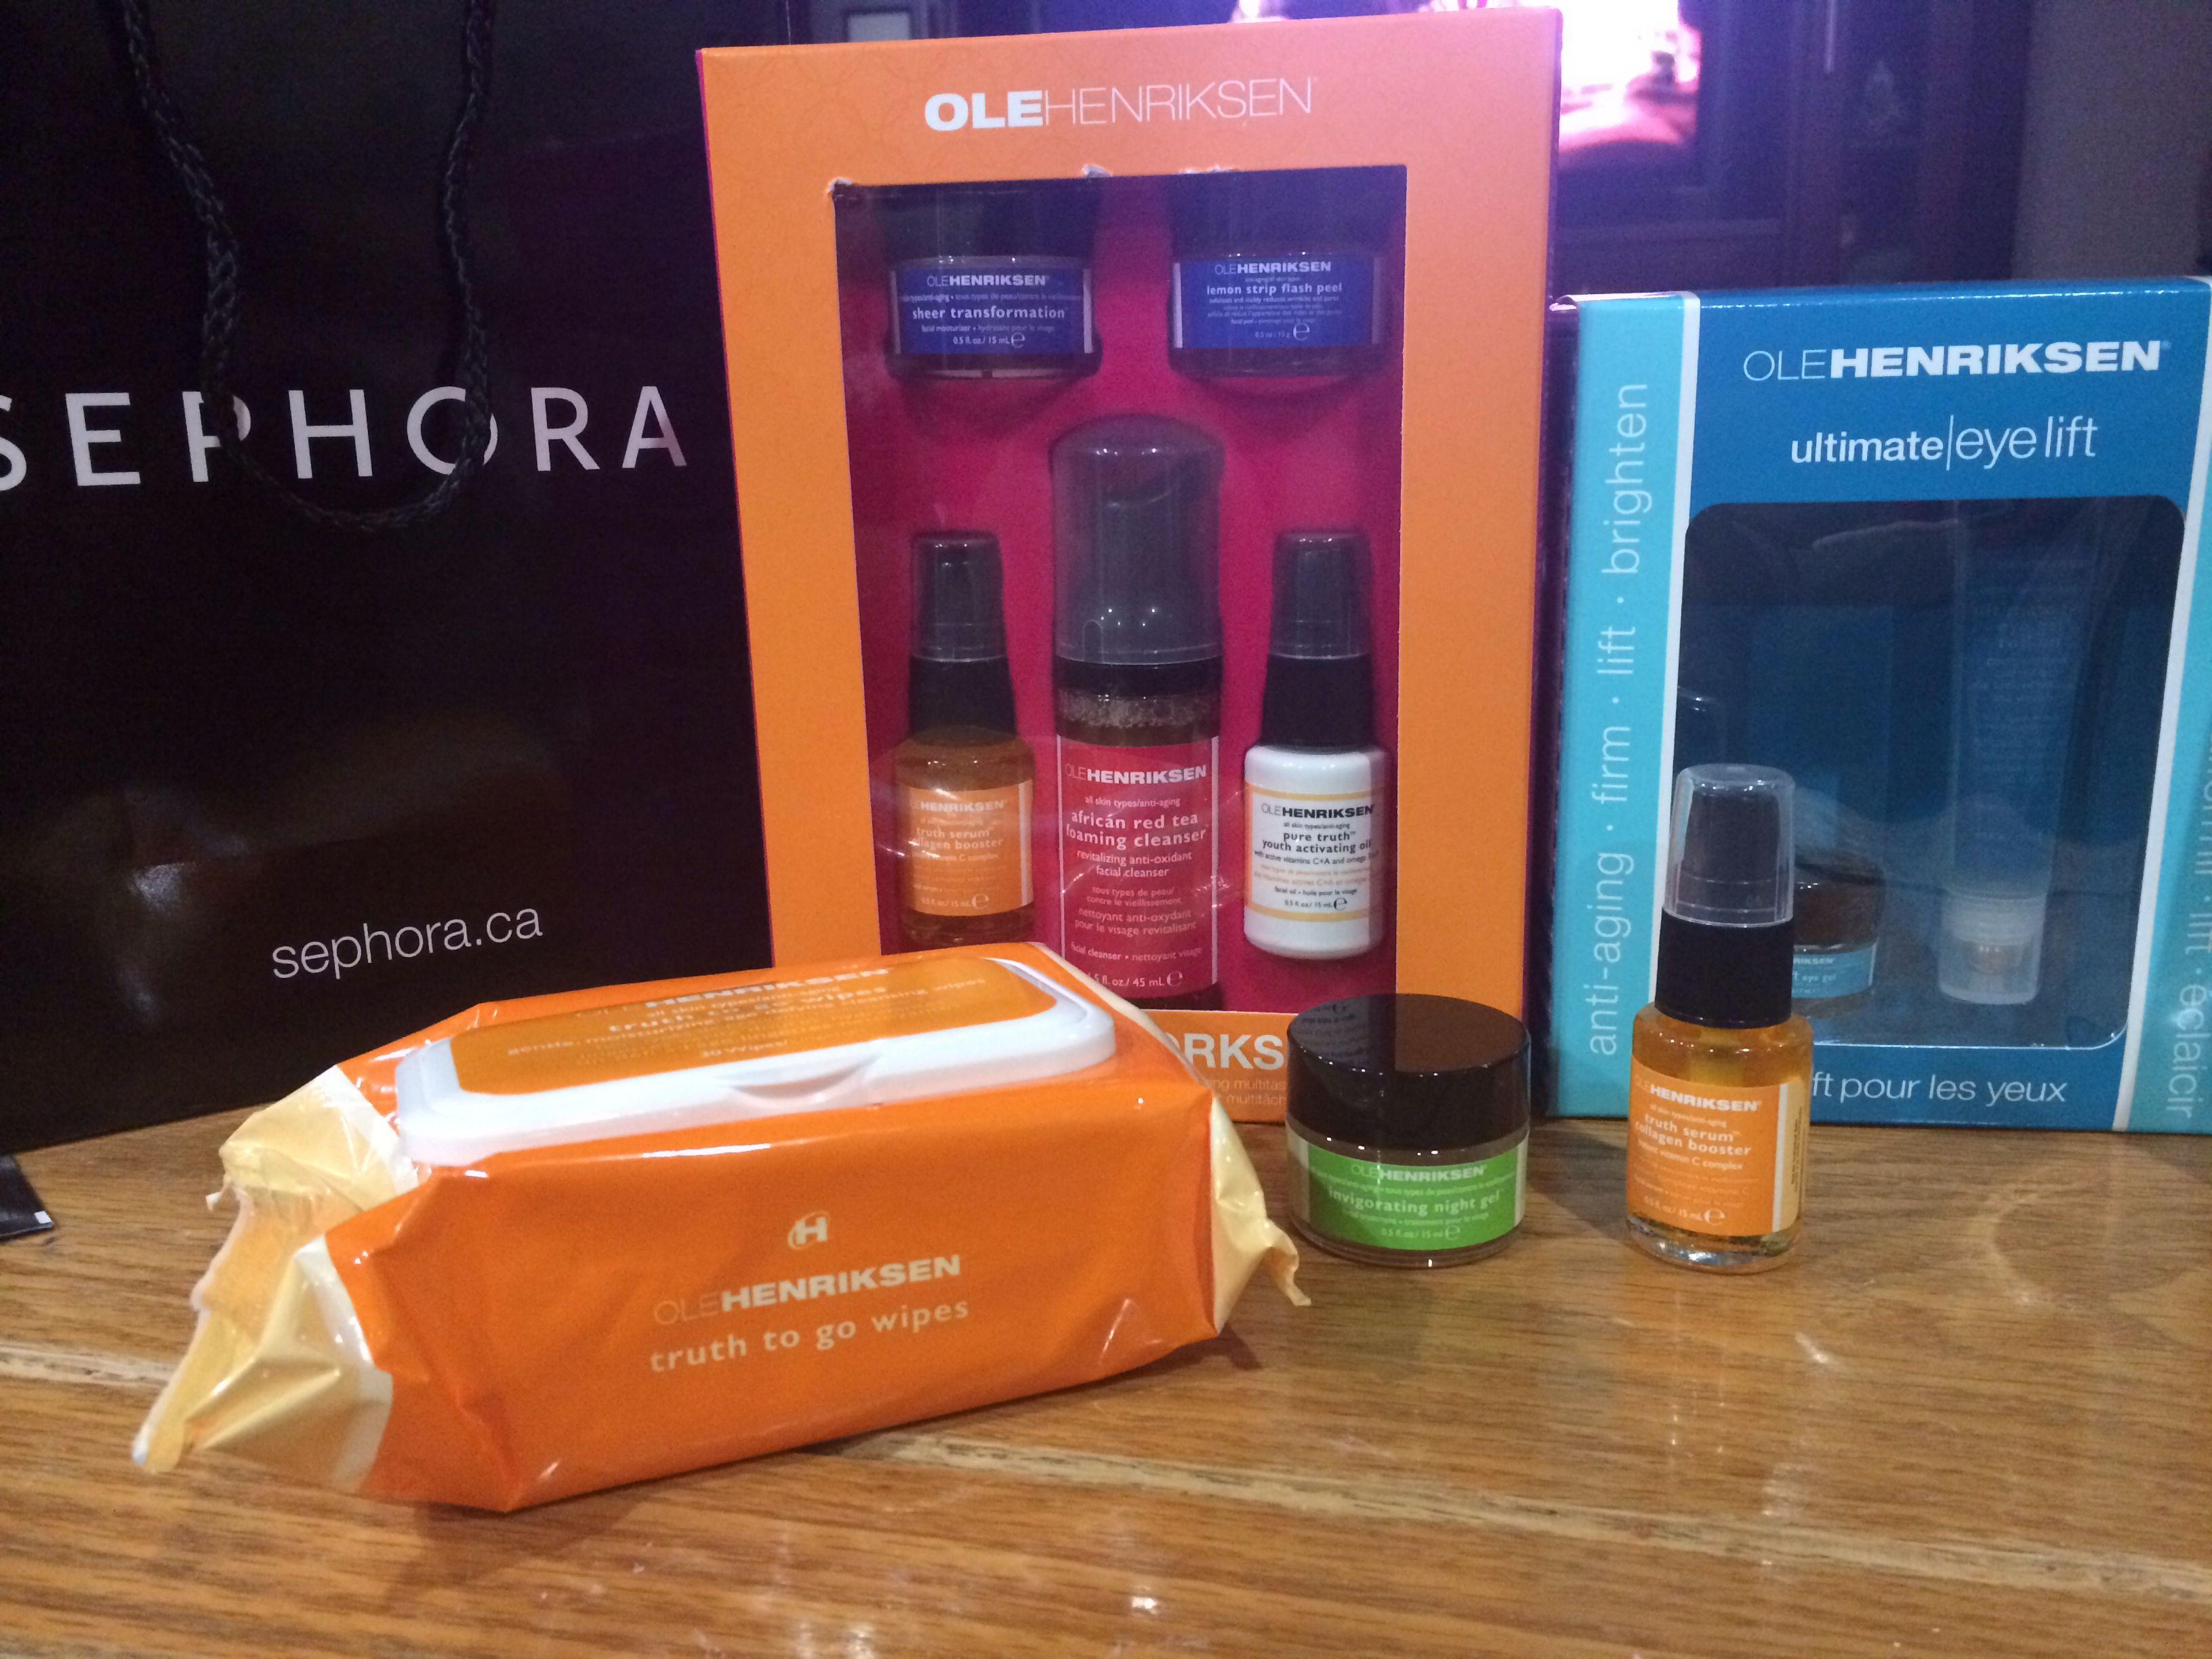 Ole henriksen Love this skincare line @Sephora @makeuphairnails101 #olehenriksen #skincare